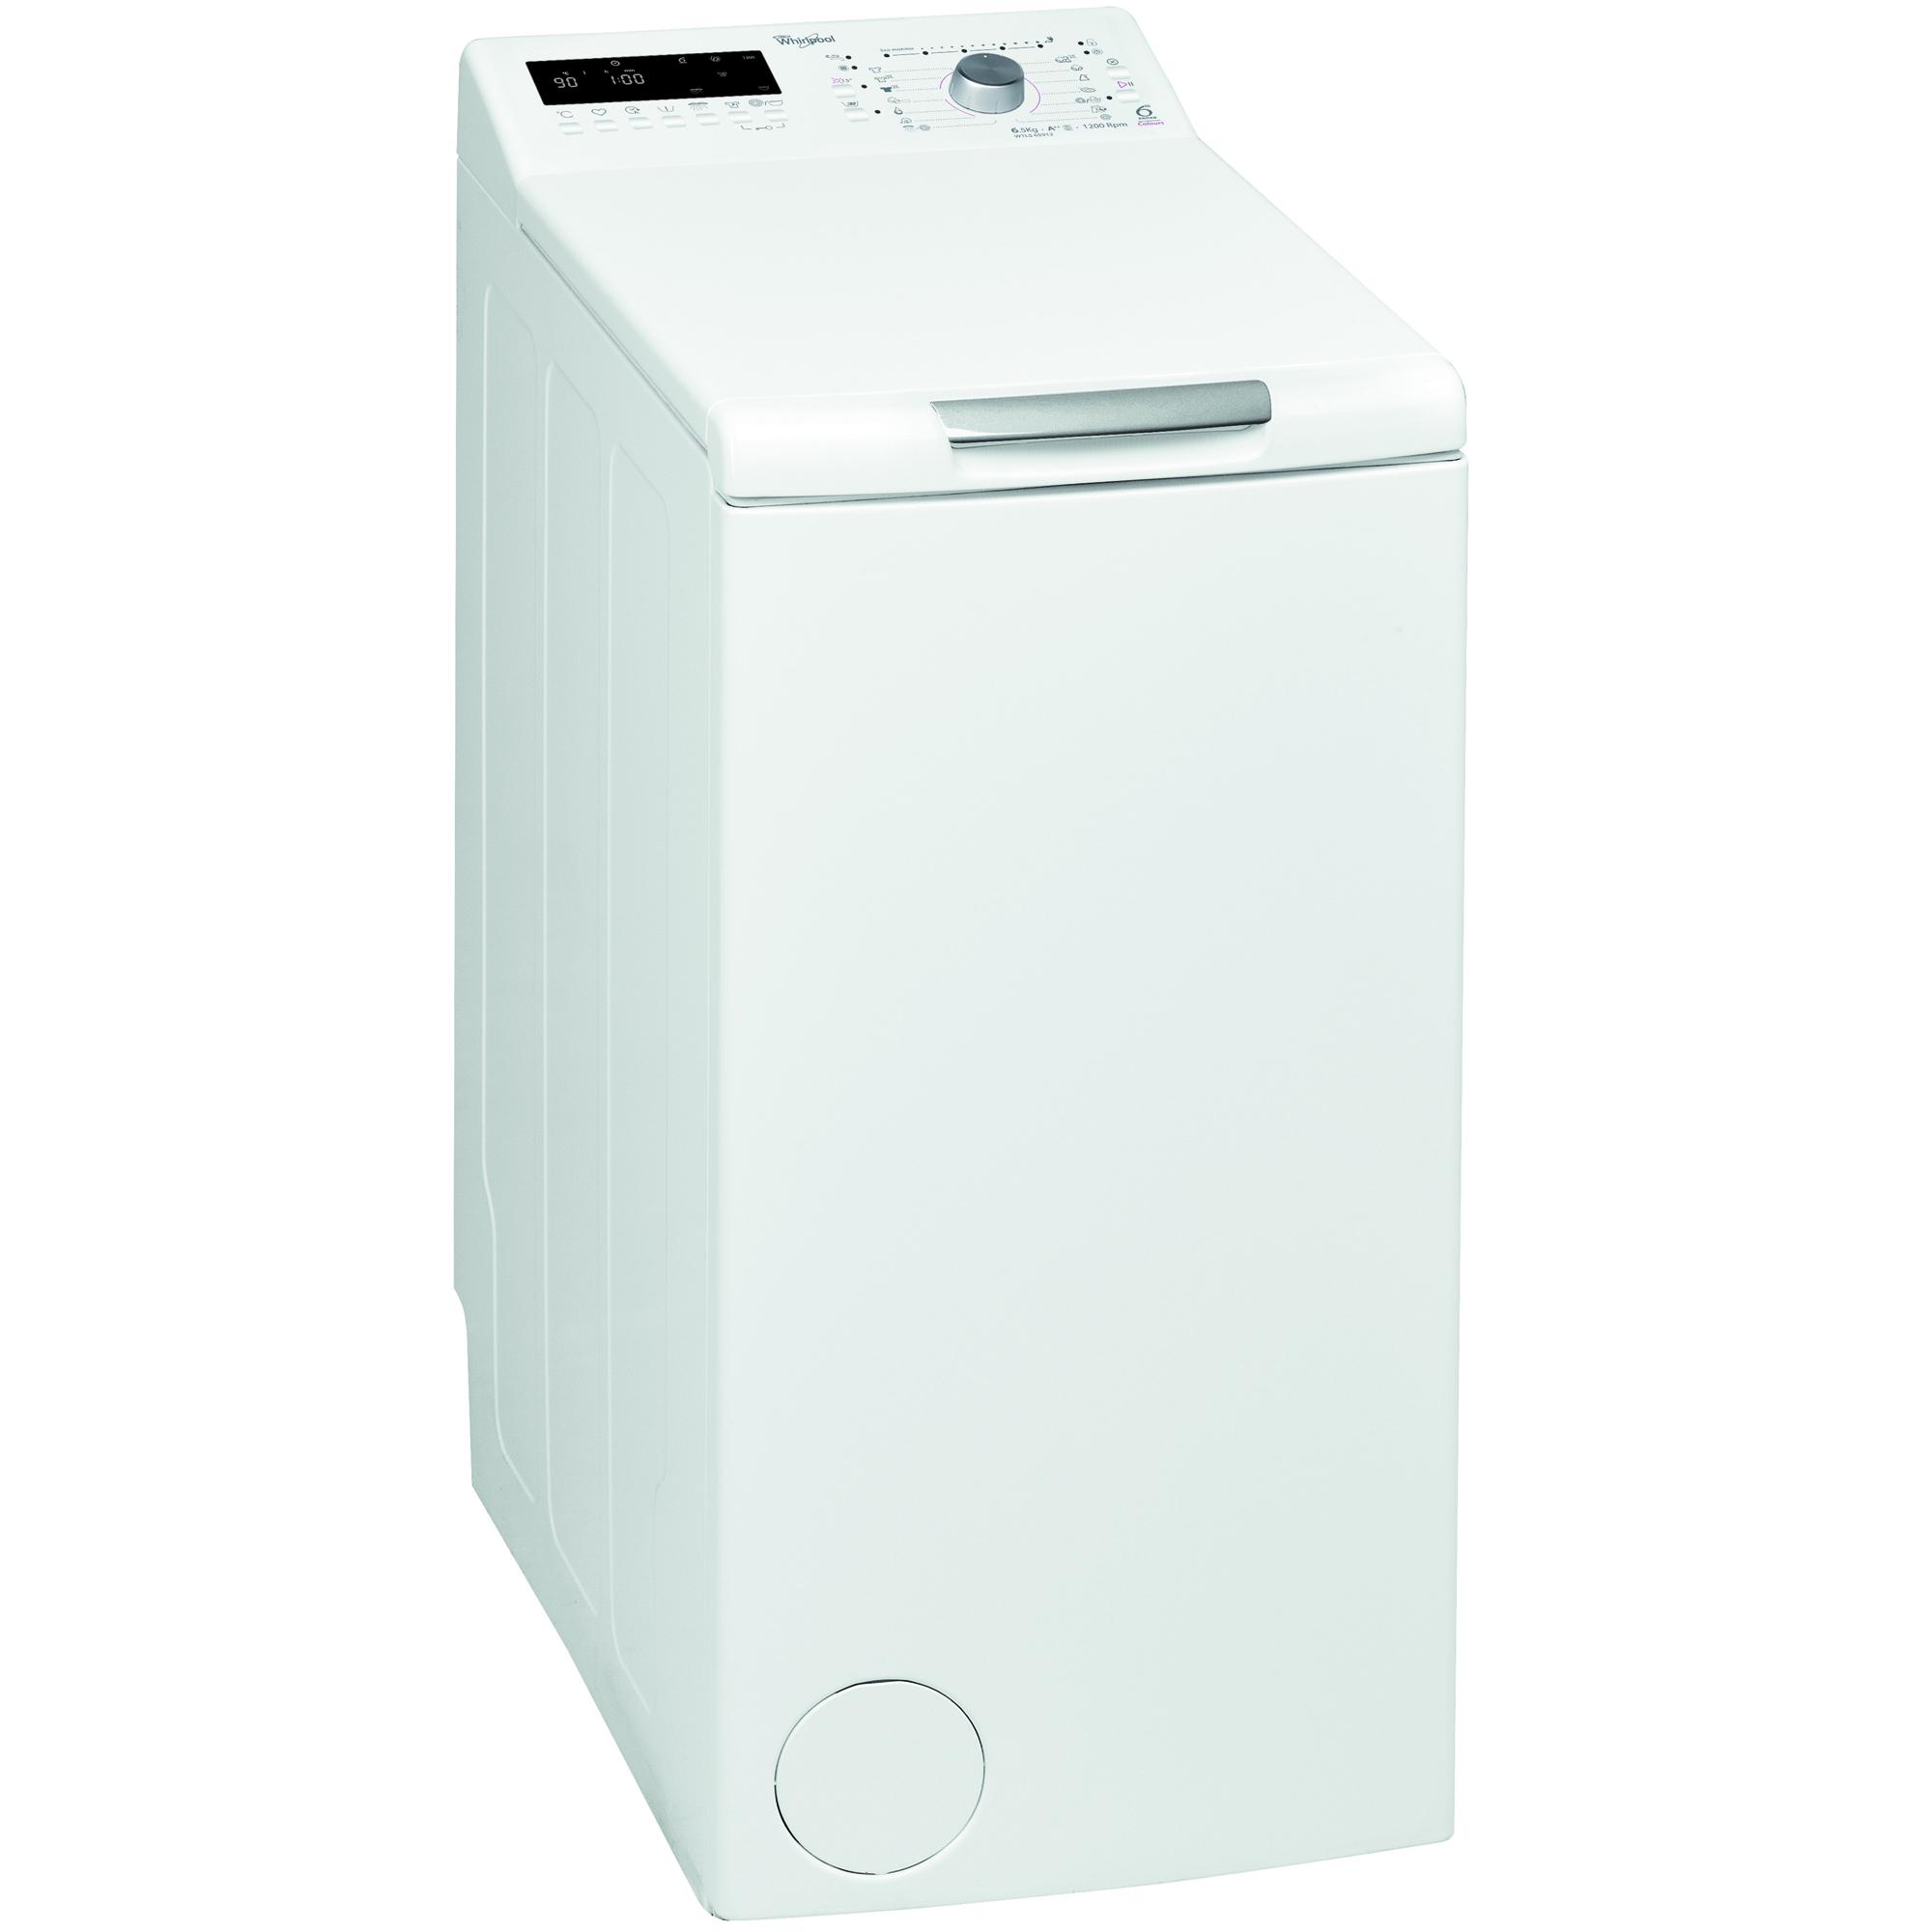 Masina de spalat rufe Whirlpool WTLS 65912